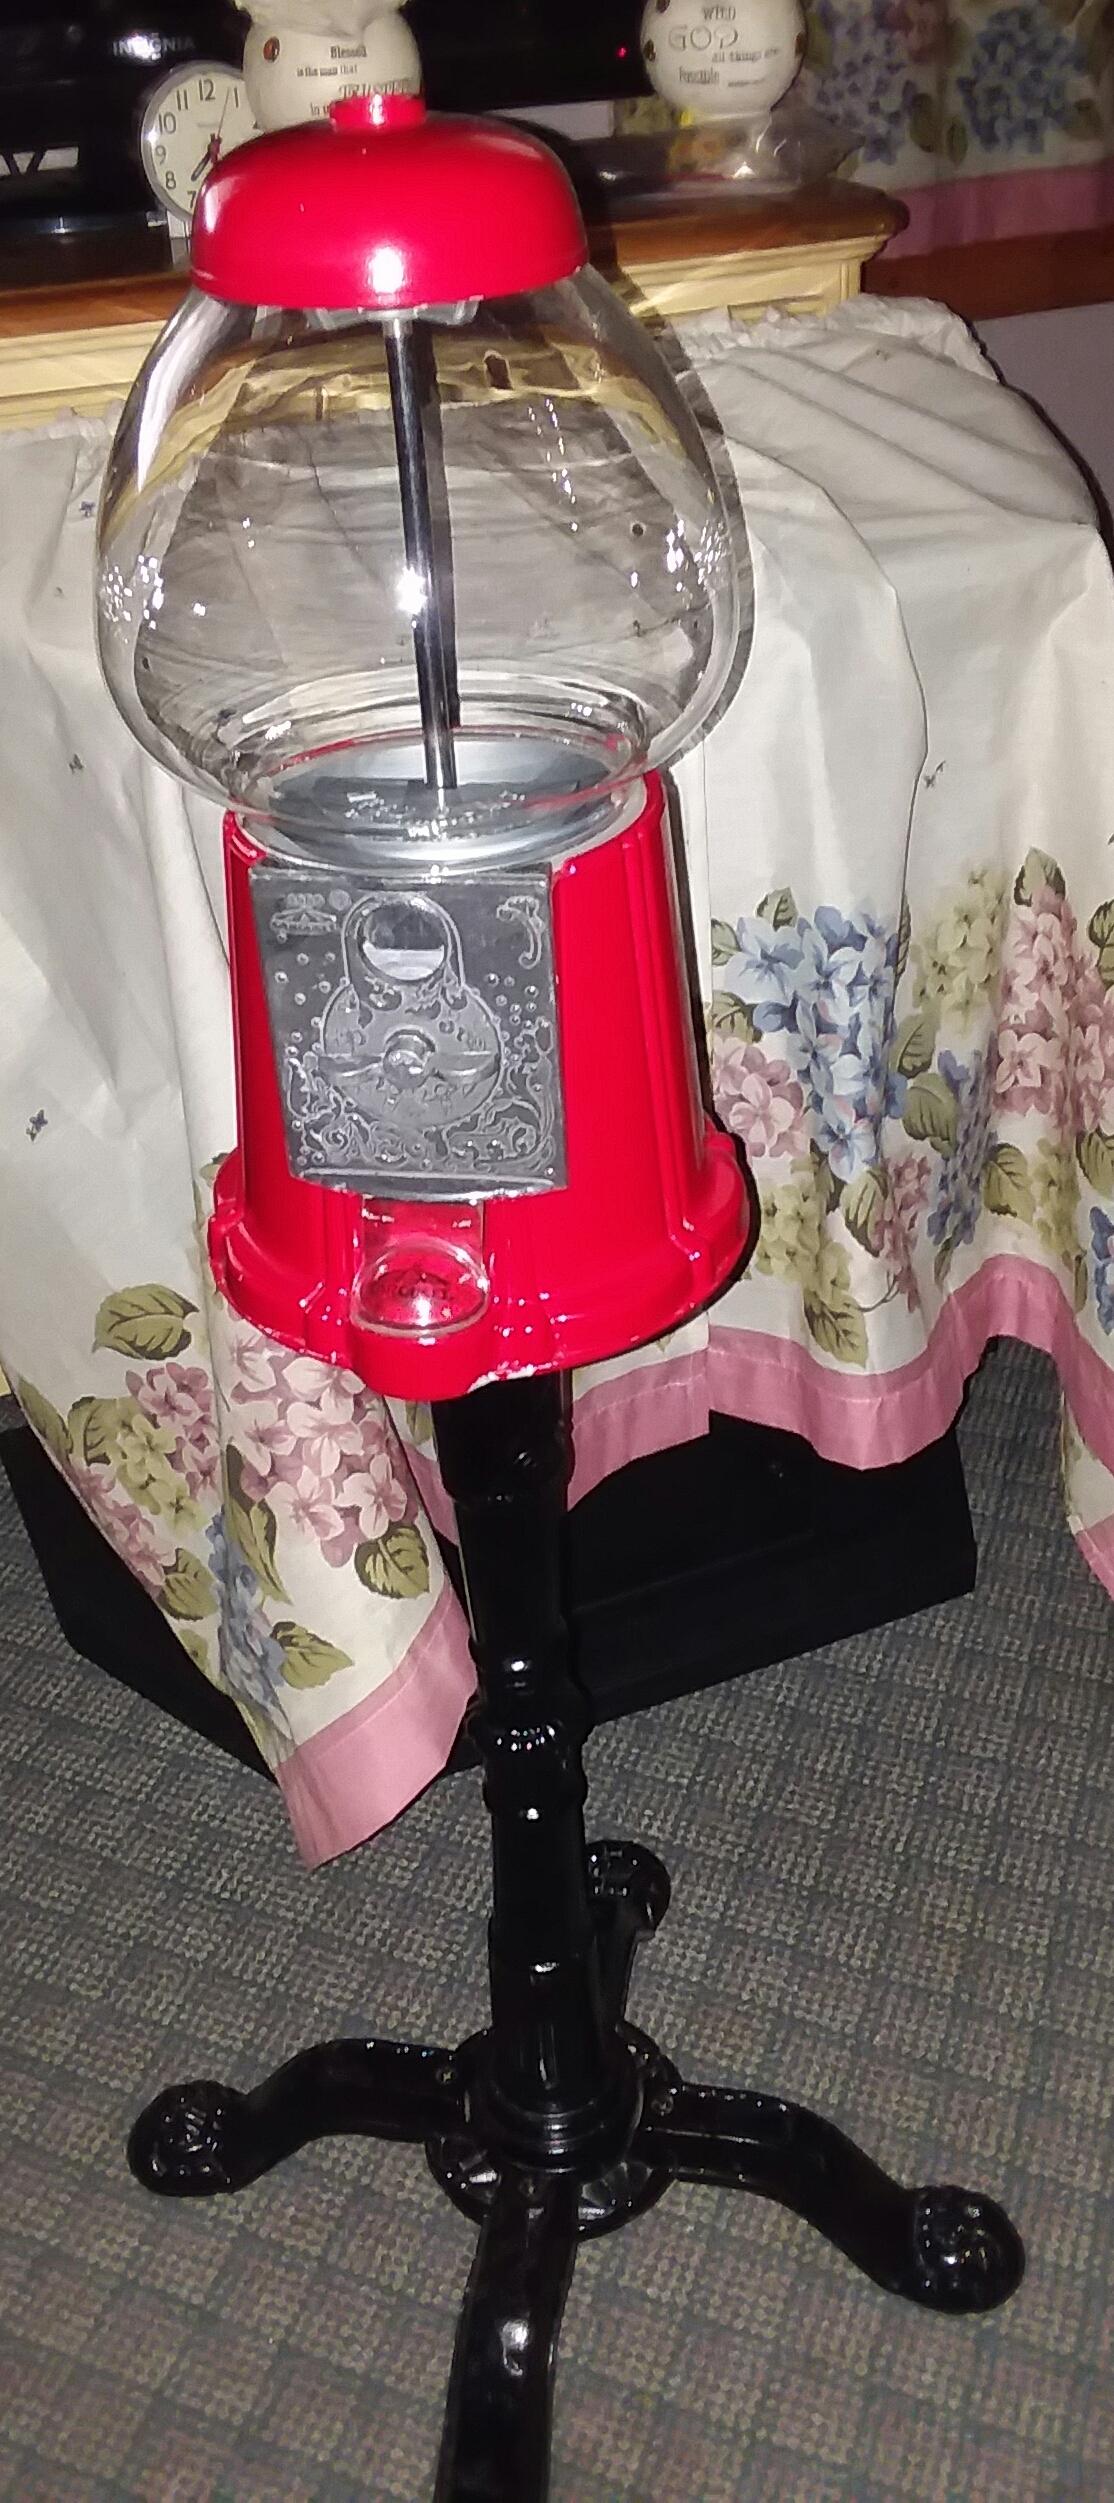 Carousel Bubblegum Machine on stand